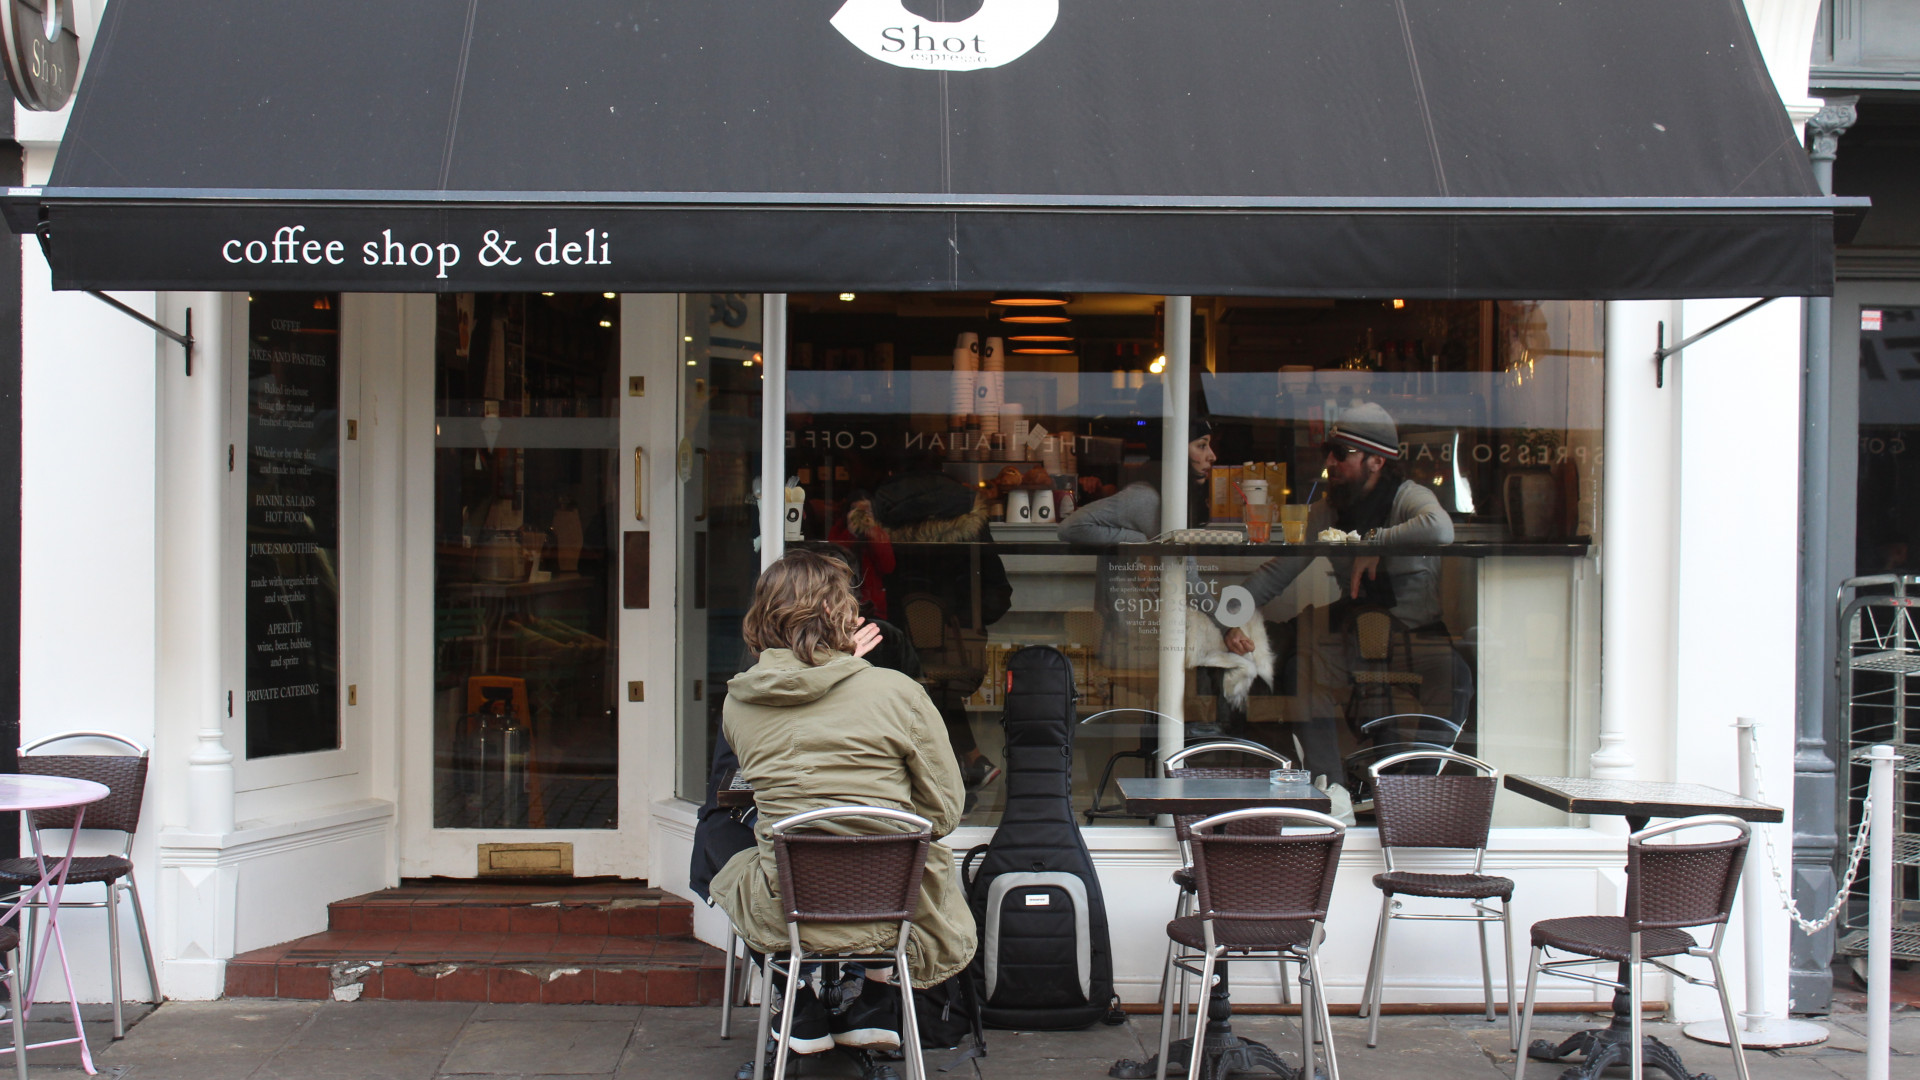 London's coffee shops: Shot Espresso